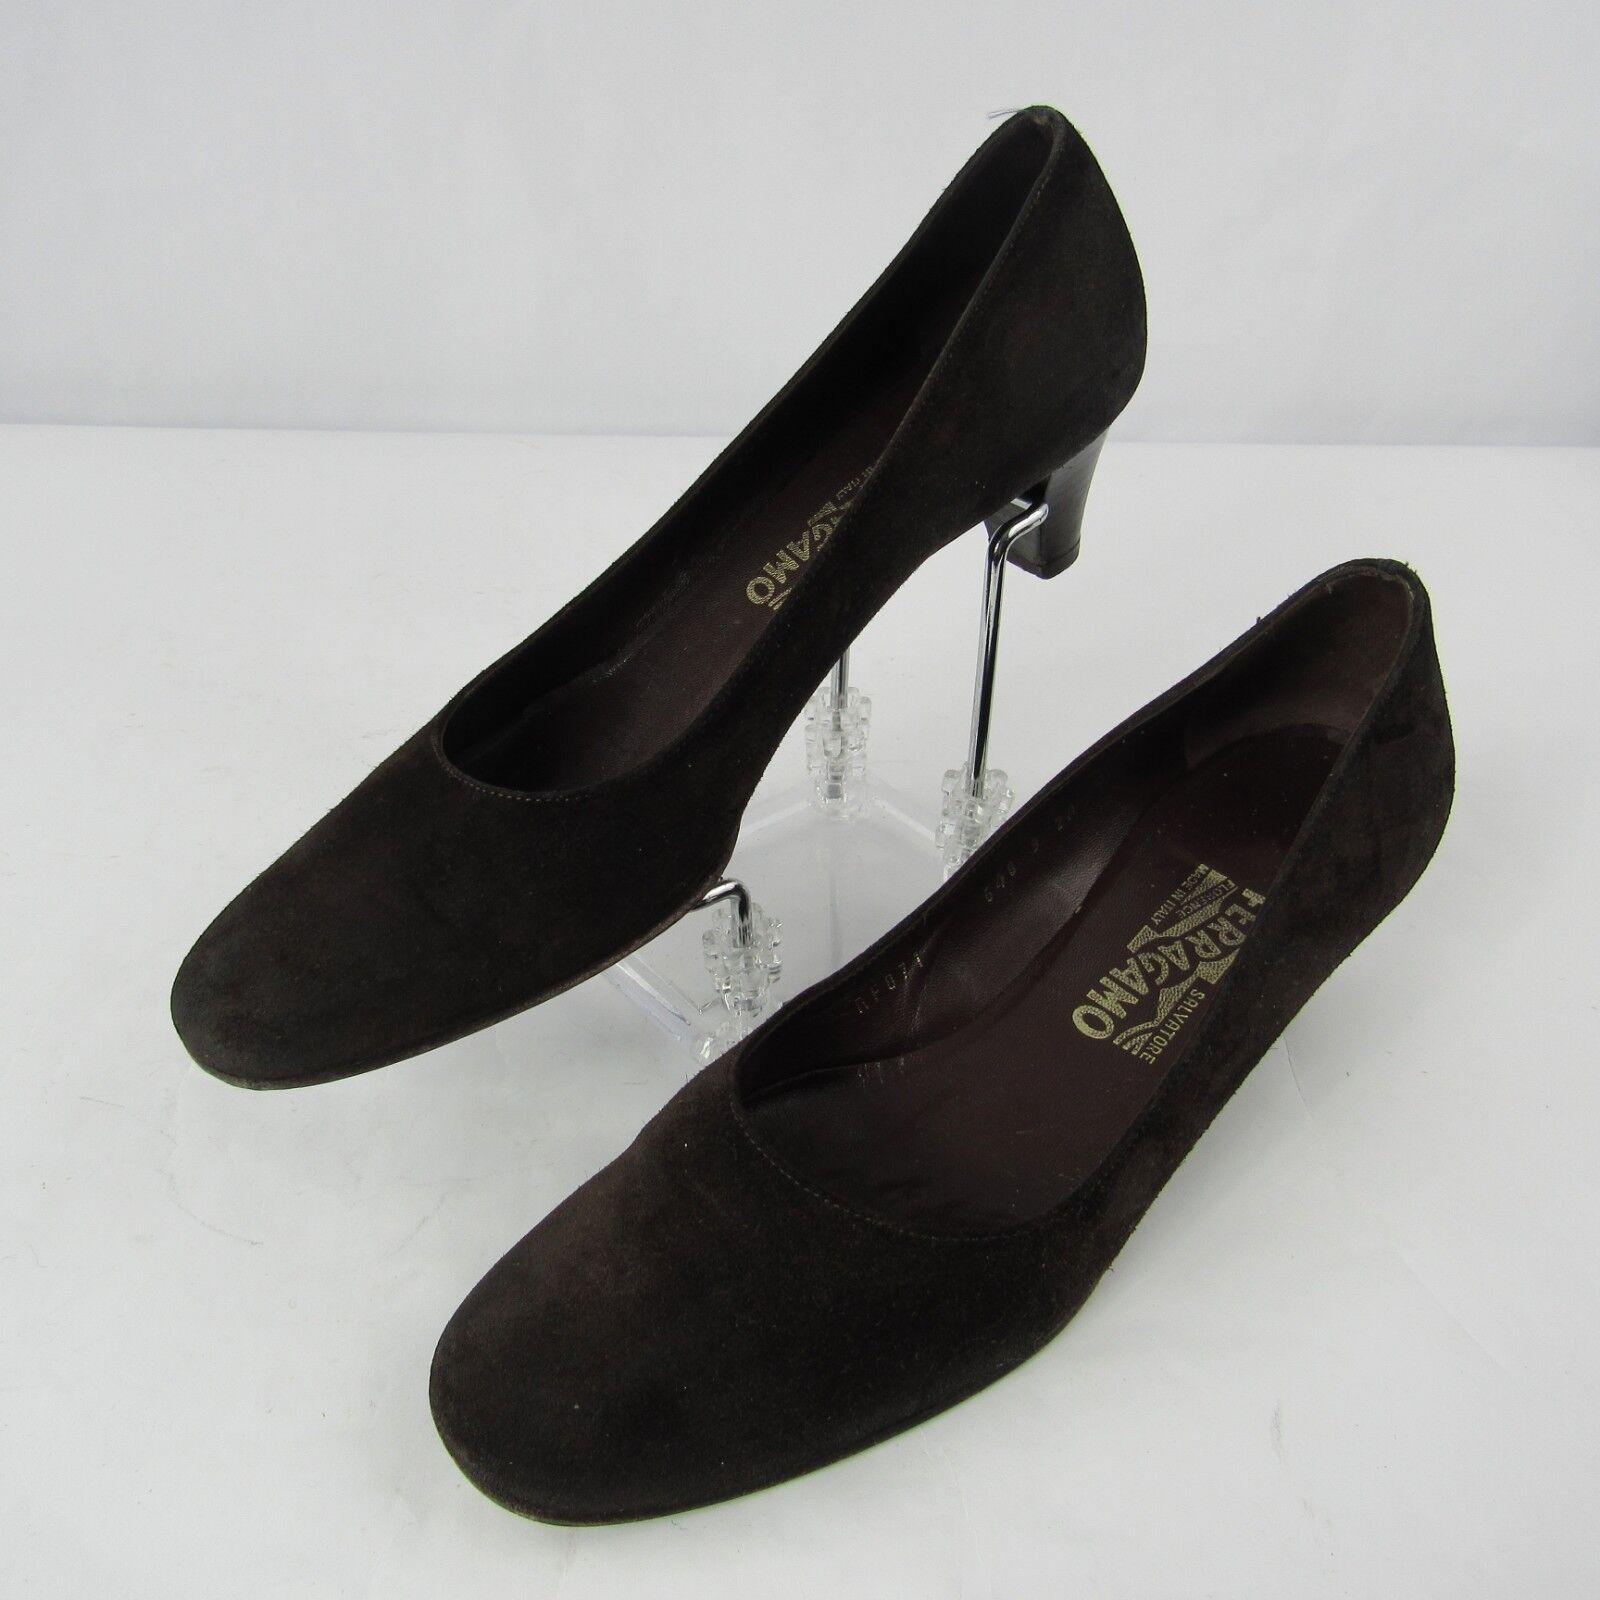 Salvatore Ferragamo Size 9 2A Narrow Suede Leather Heel Pumps shoes Brown